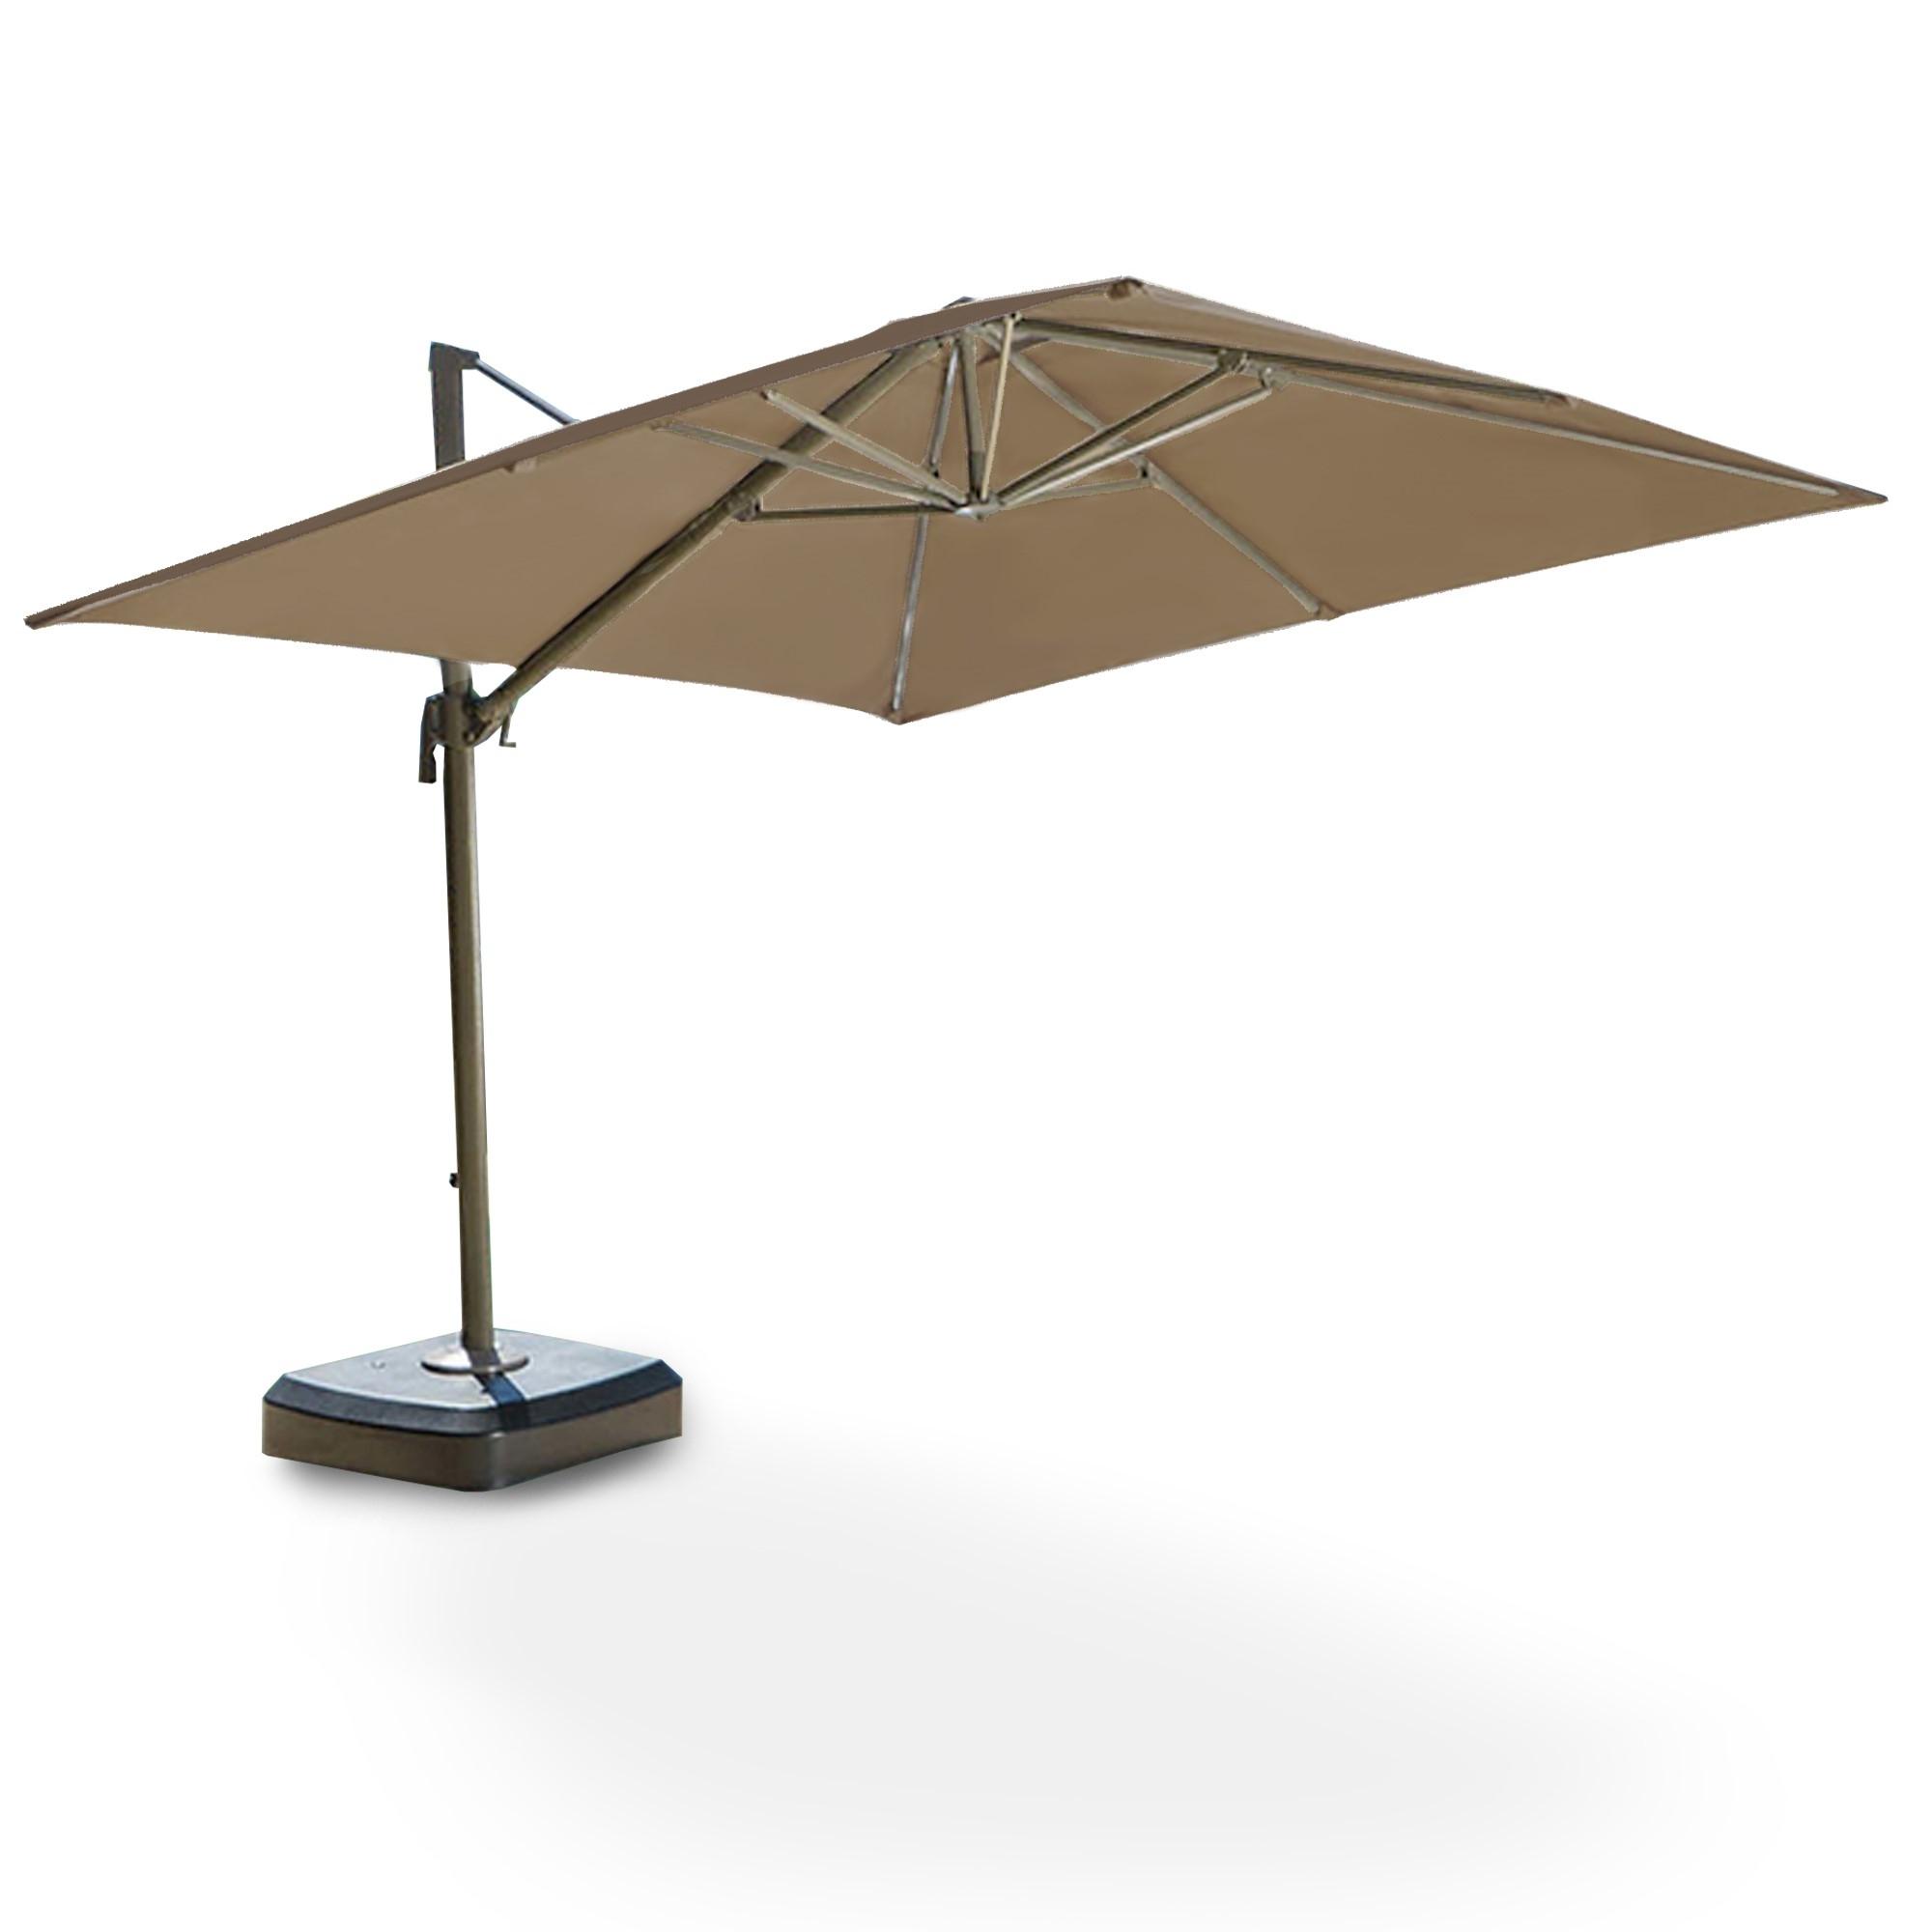 Costco Replacement Umbrella Canopy – Garden Winds Regarding Newest Costco Cantilever Patio Umbrellas (View 10 of 20)